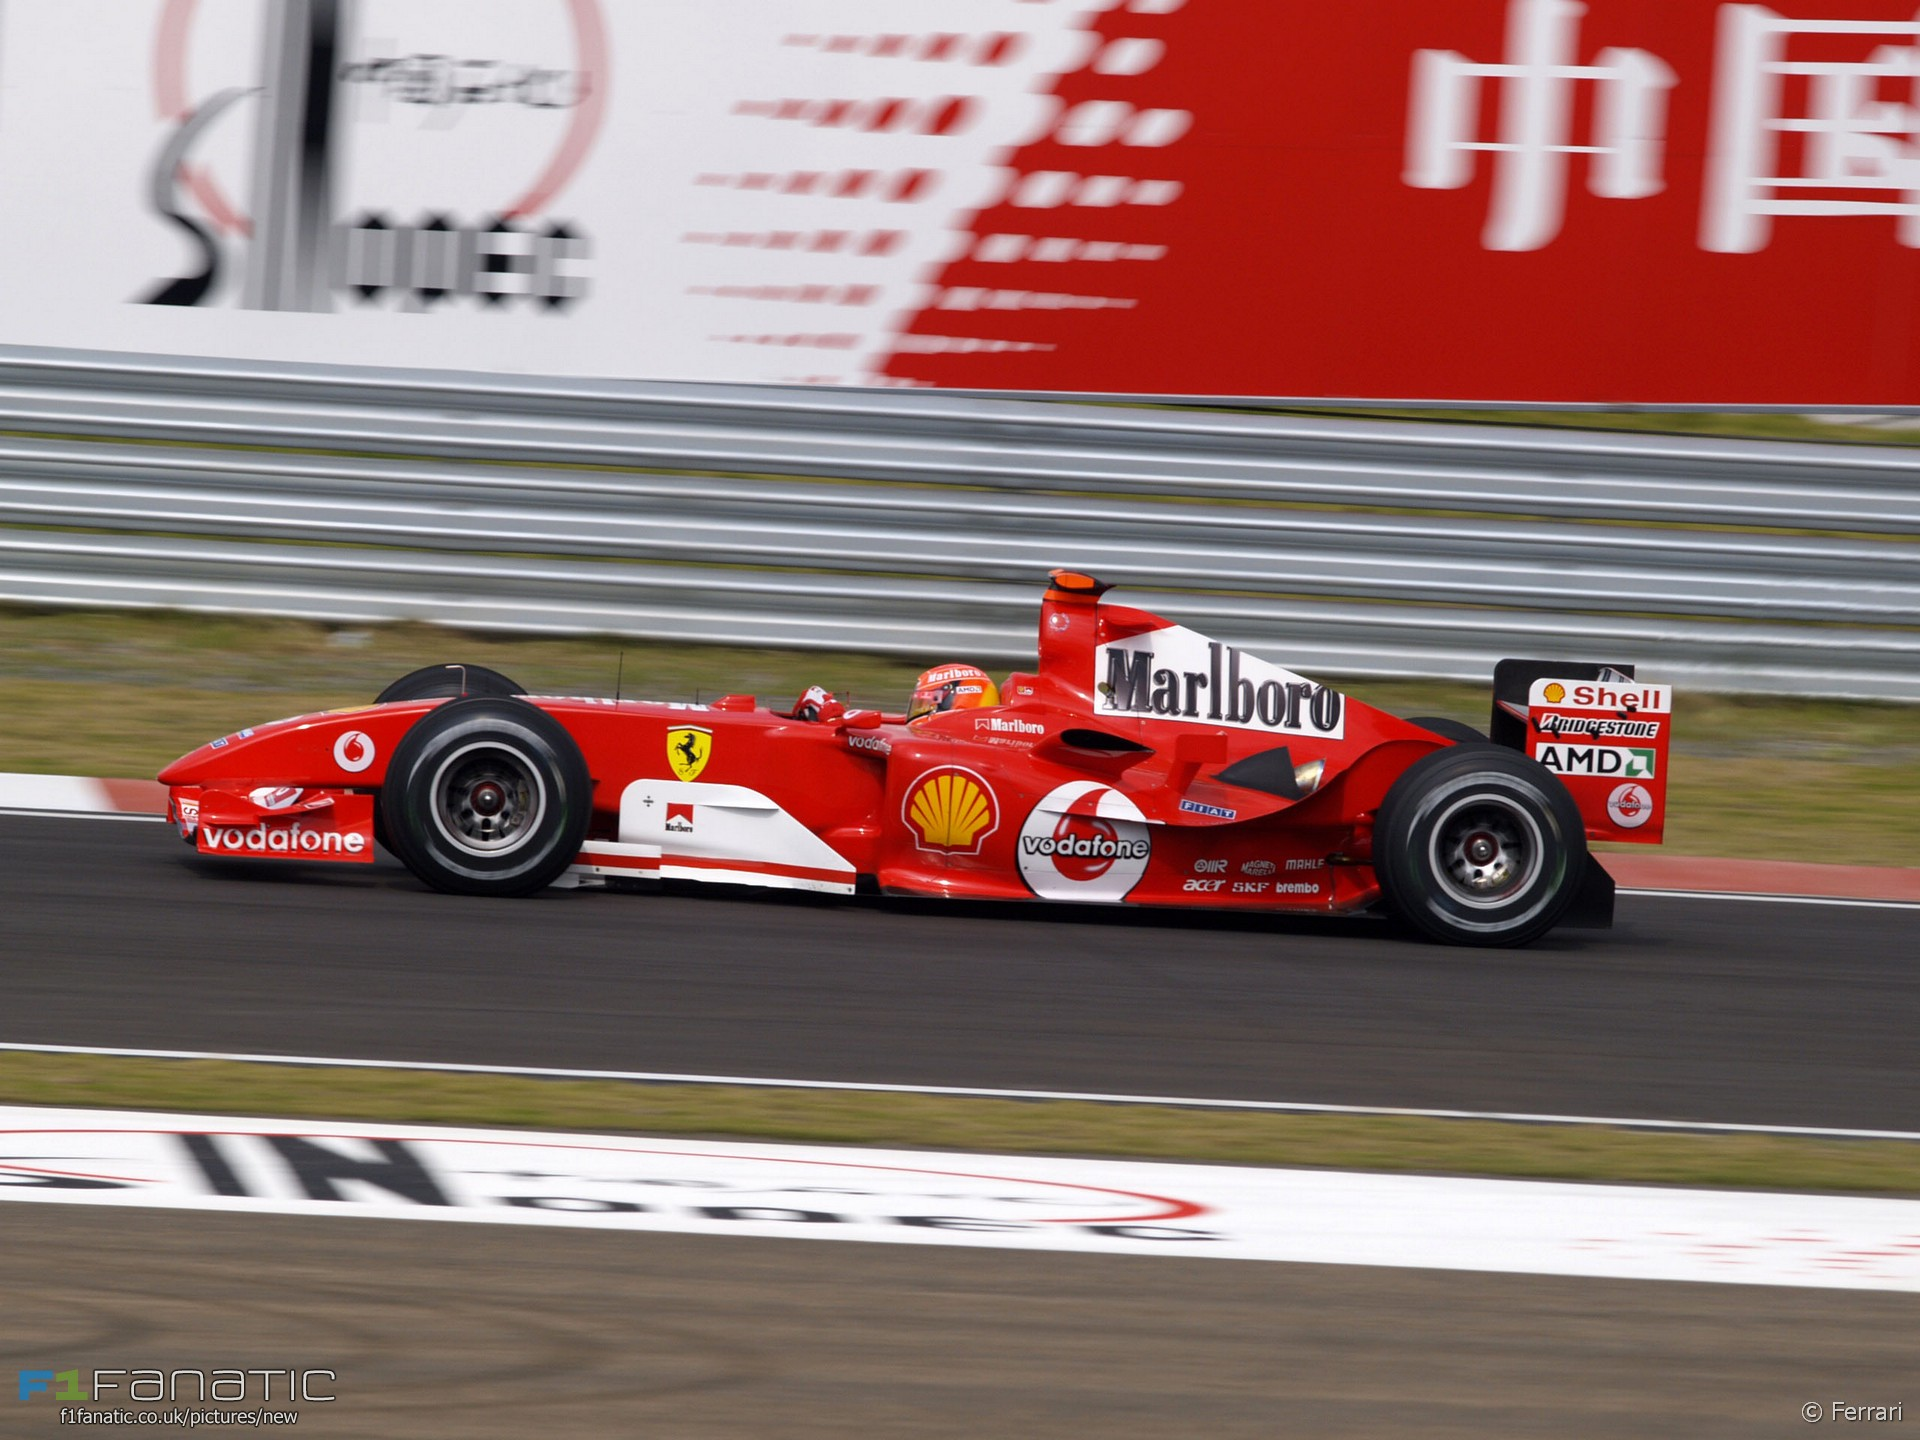 Michael Schumacher, Ferrari, Shanghai, 2004